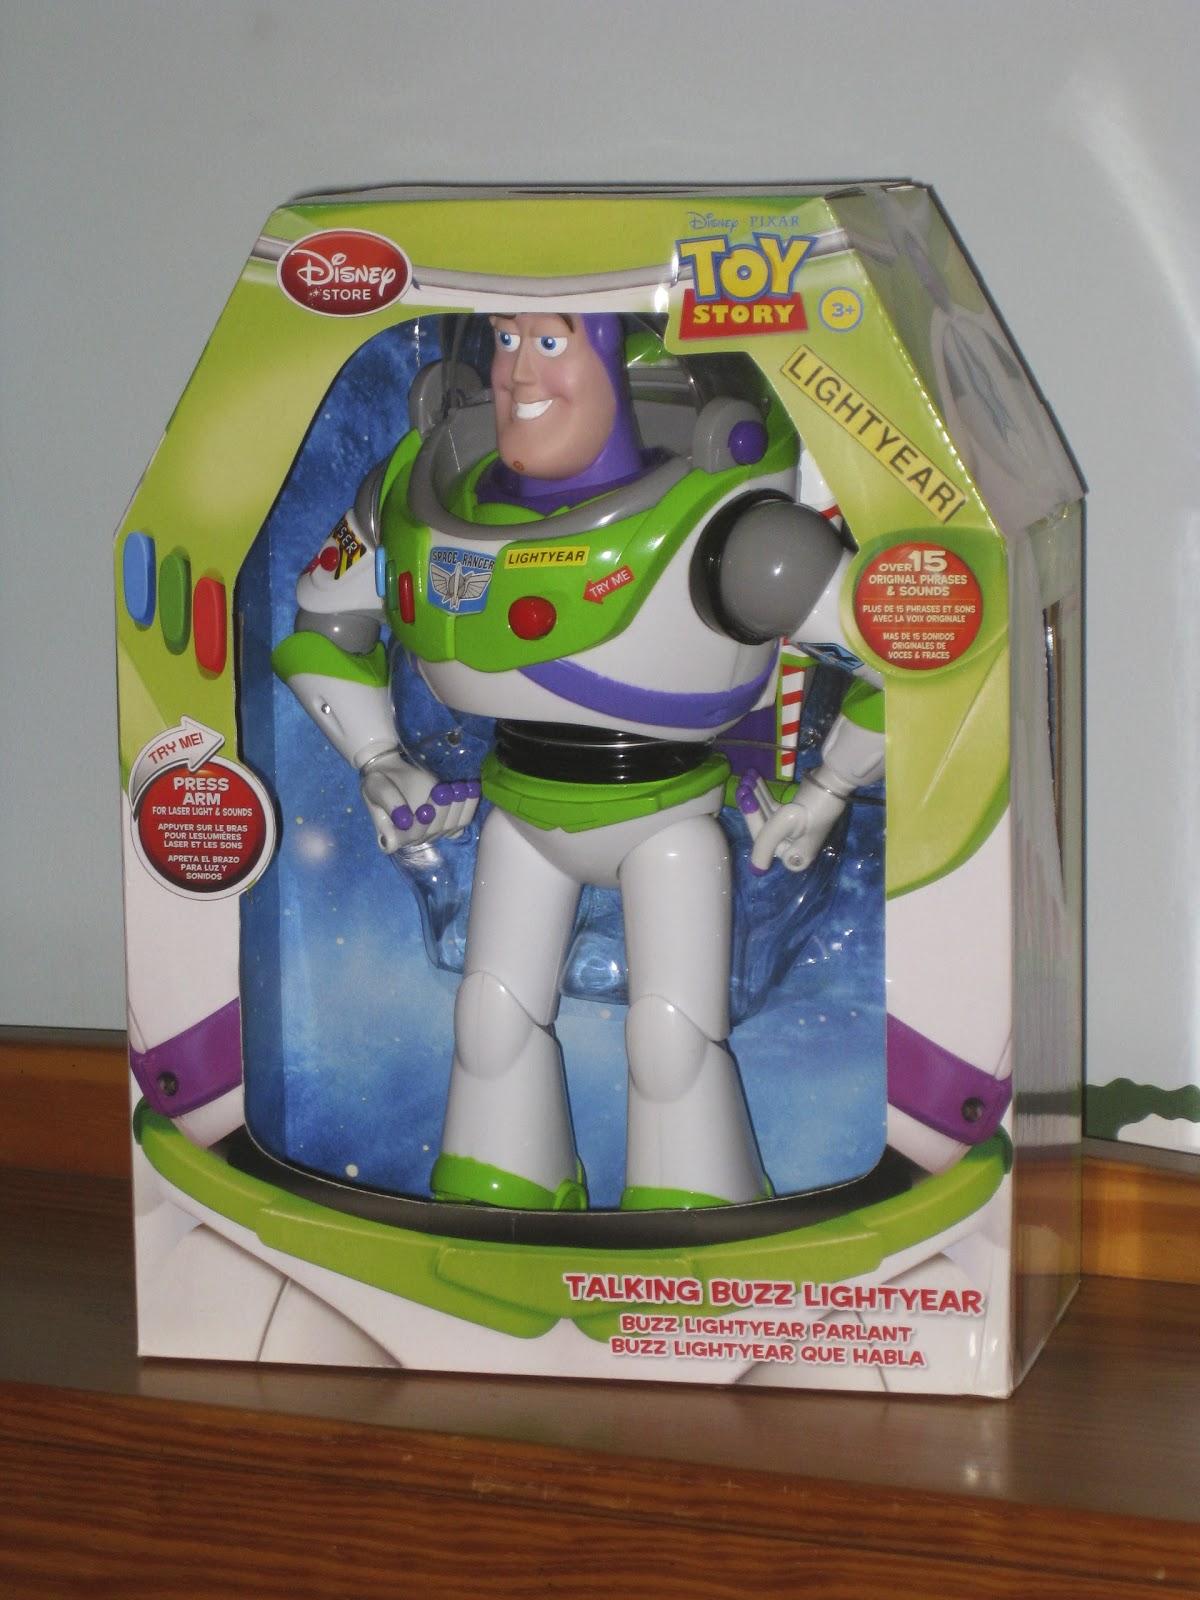 Disney Store Toys : Dan the pixar fan toy story disney store buzz lightyear